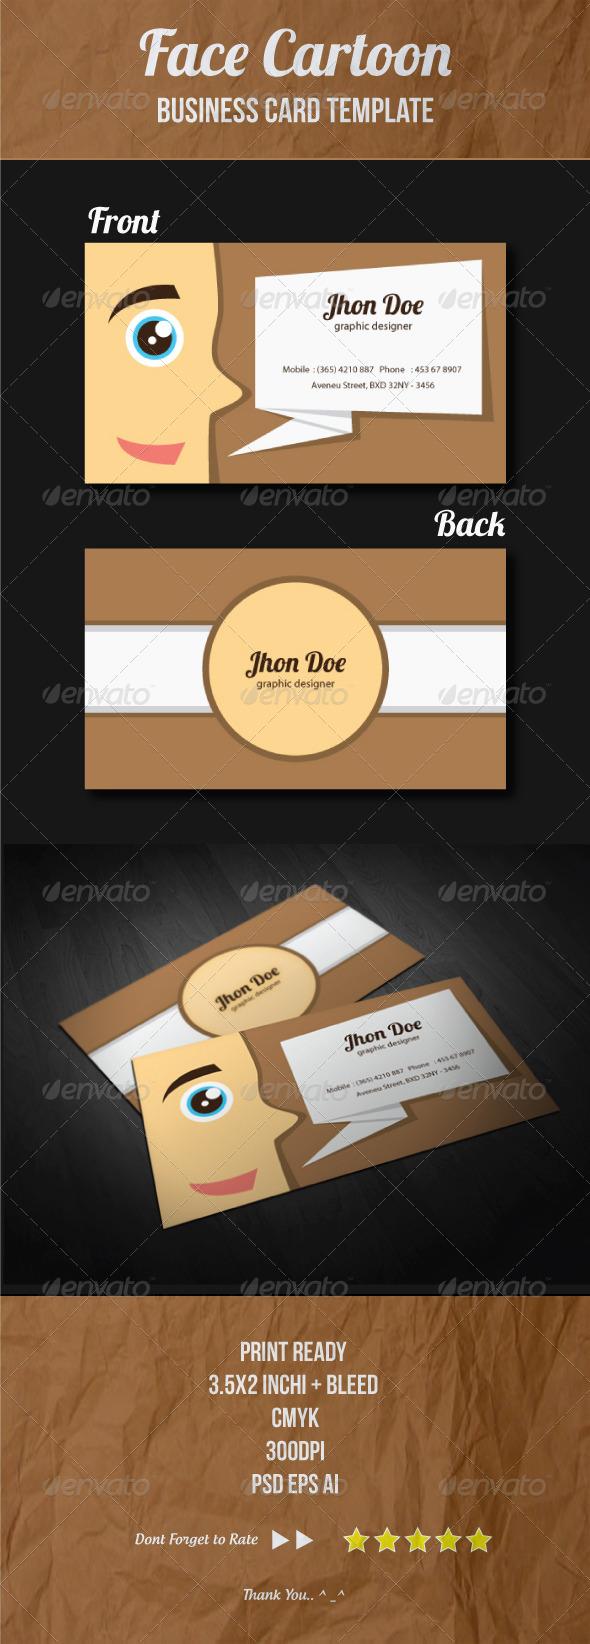 Face Cartoon Business Card Template - Creative Business Cards